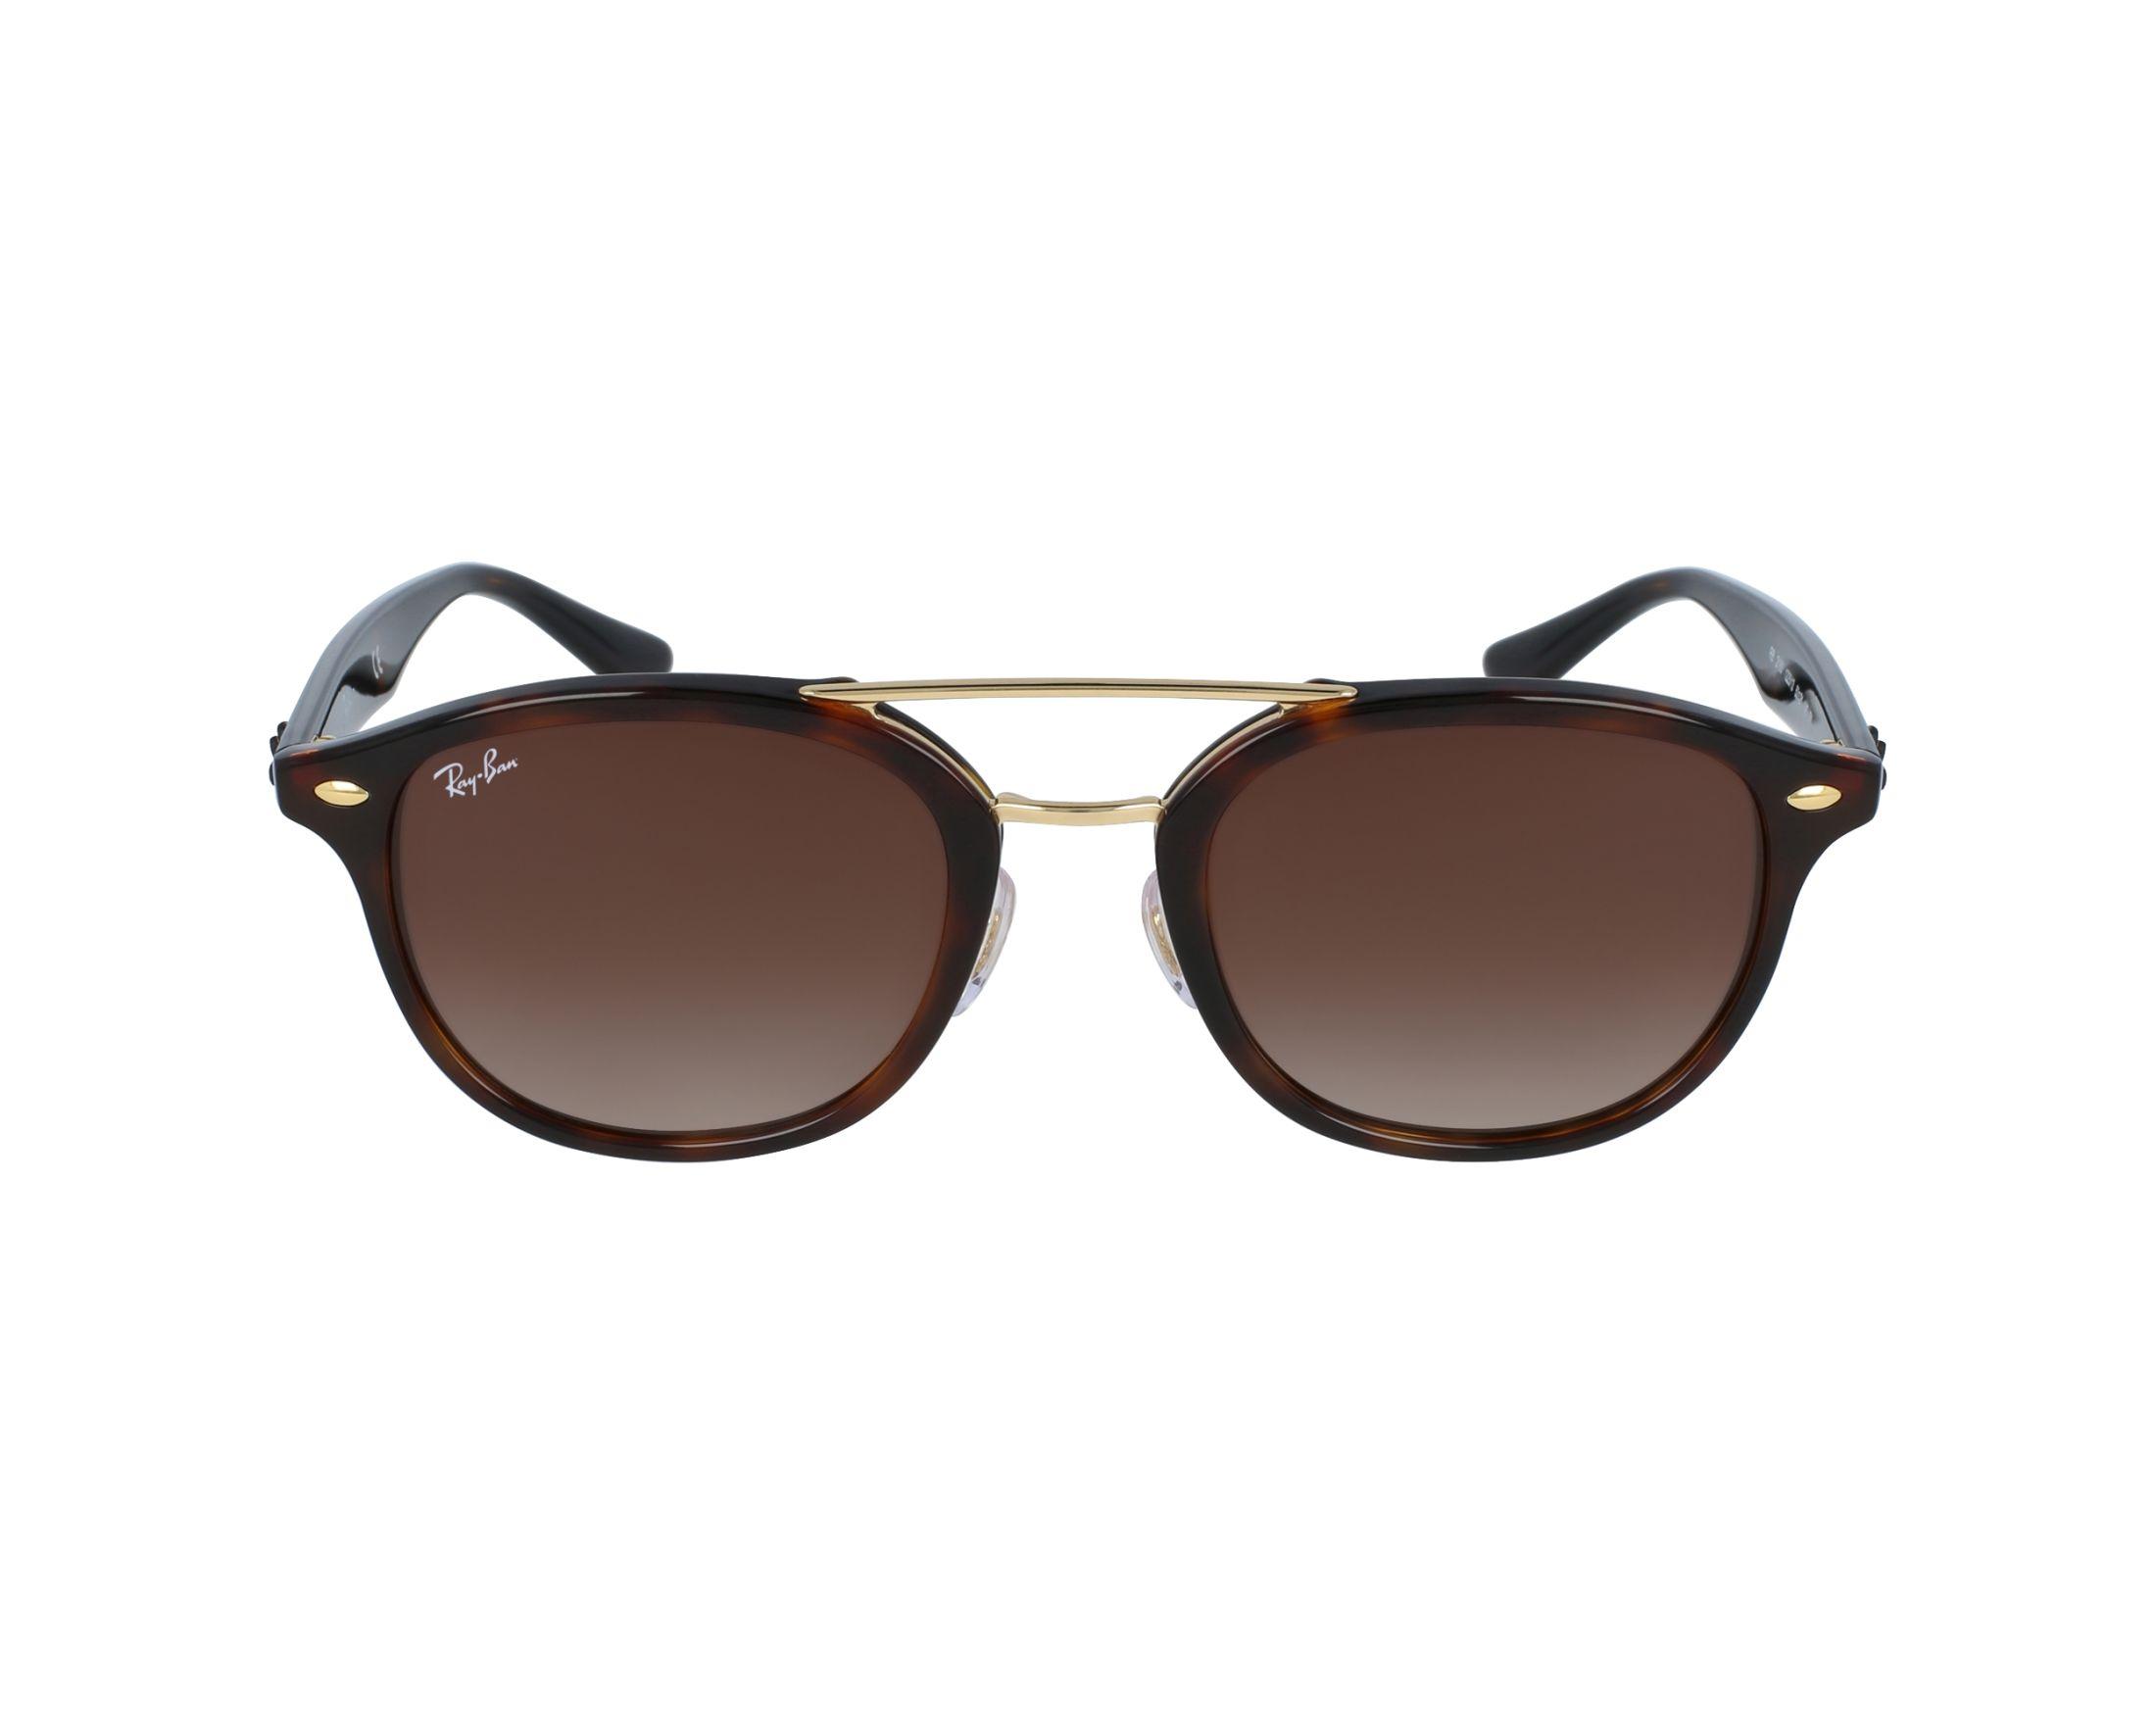 fe13b4c915f Sunglasses Ray-Ban RB-2183 122513 - Havana Gold profile view